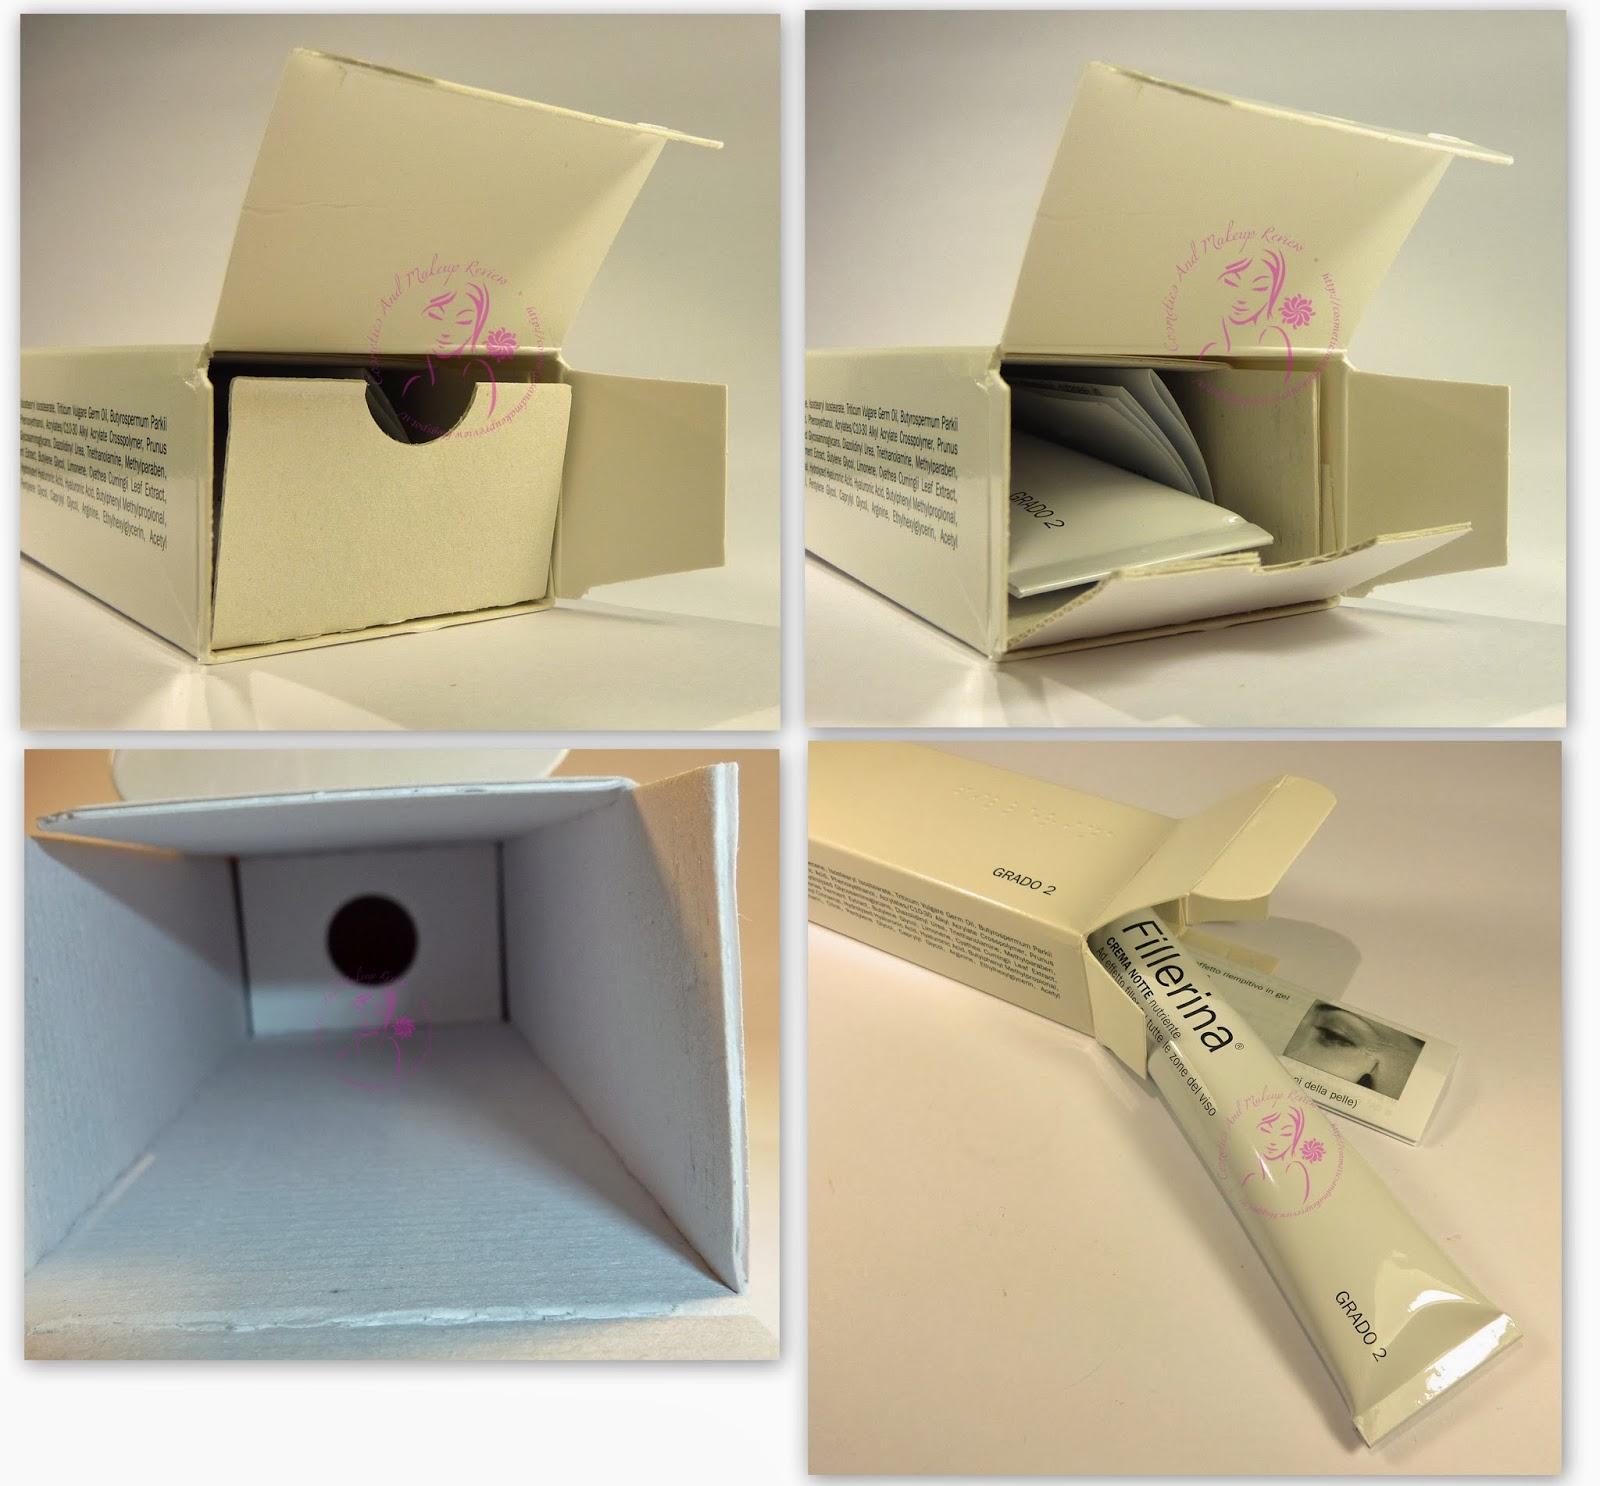 LABO - Fillerina Viso - Crema Notte - Grado 2 - packaging aperto